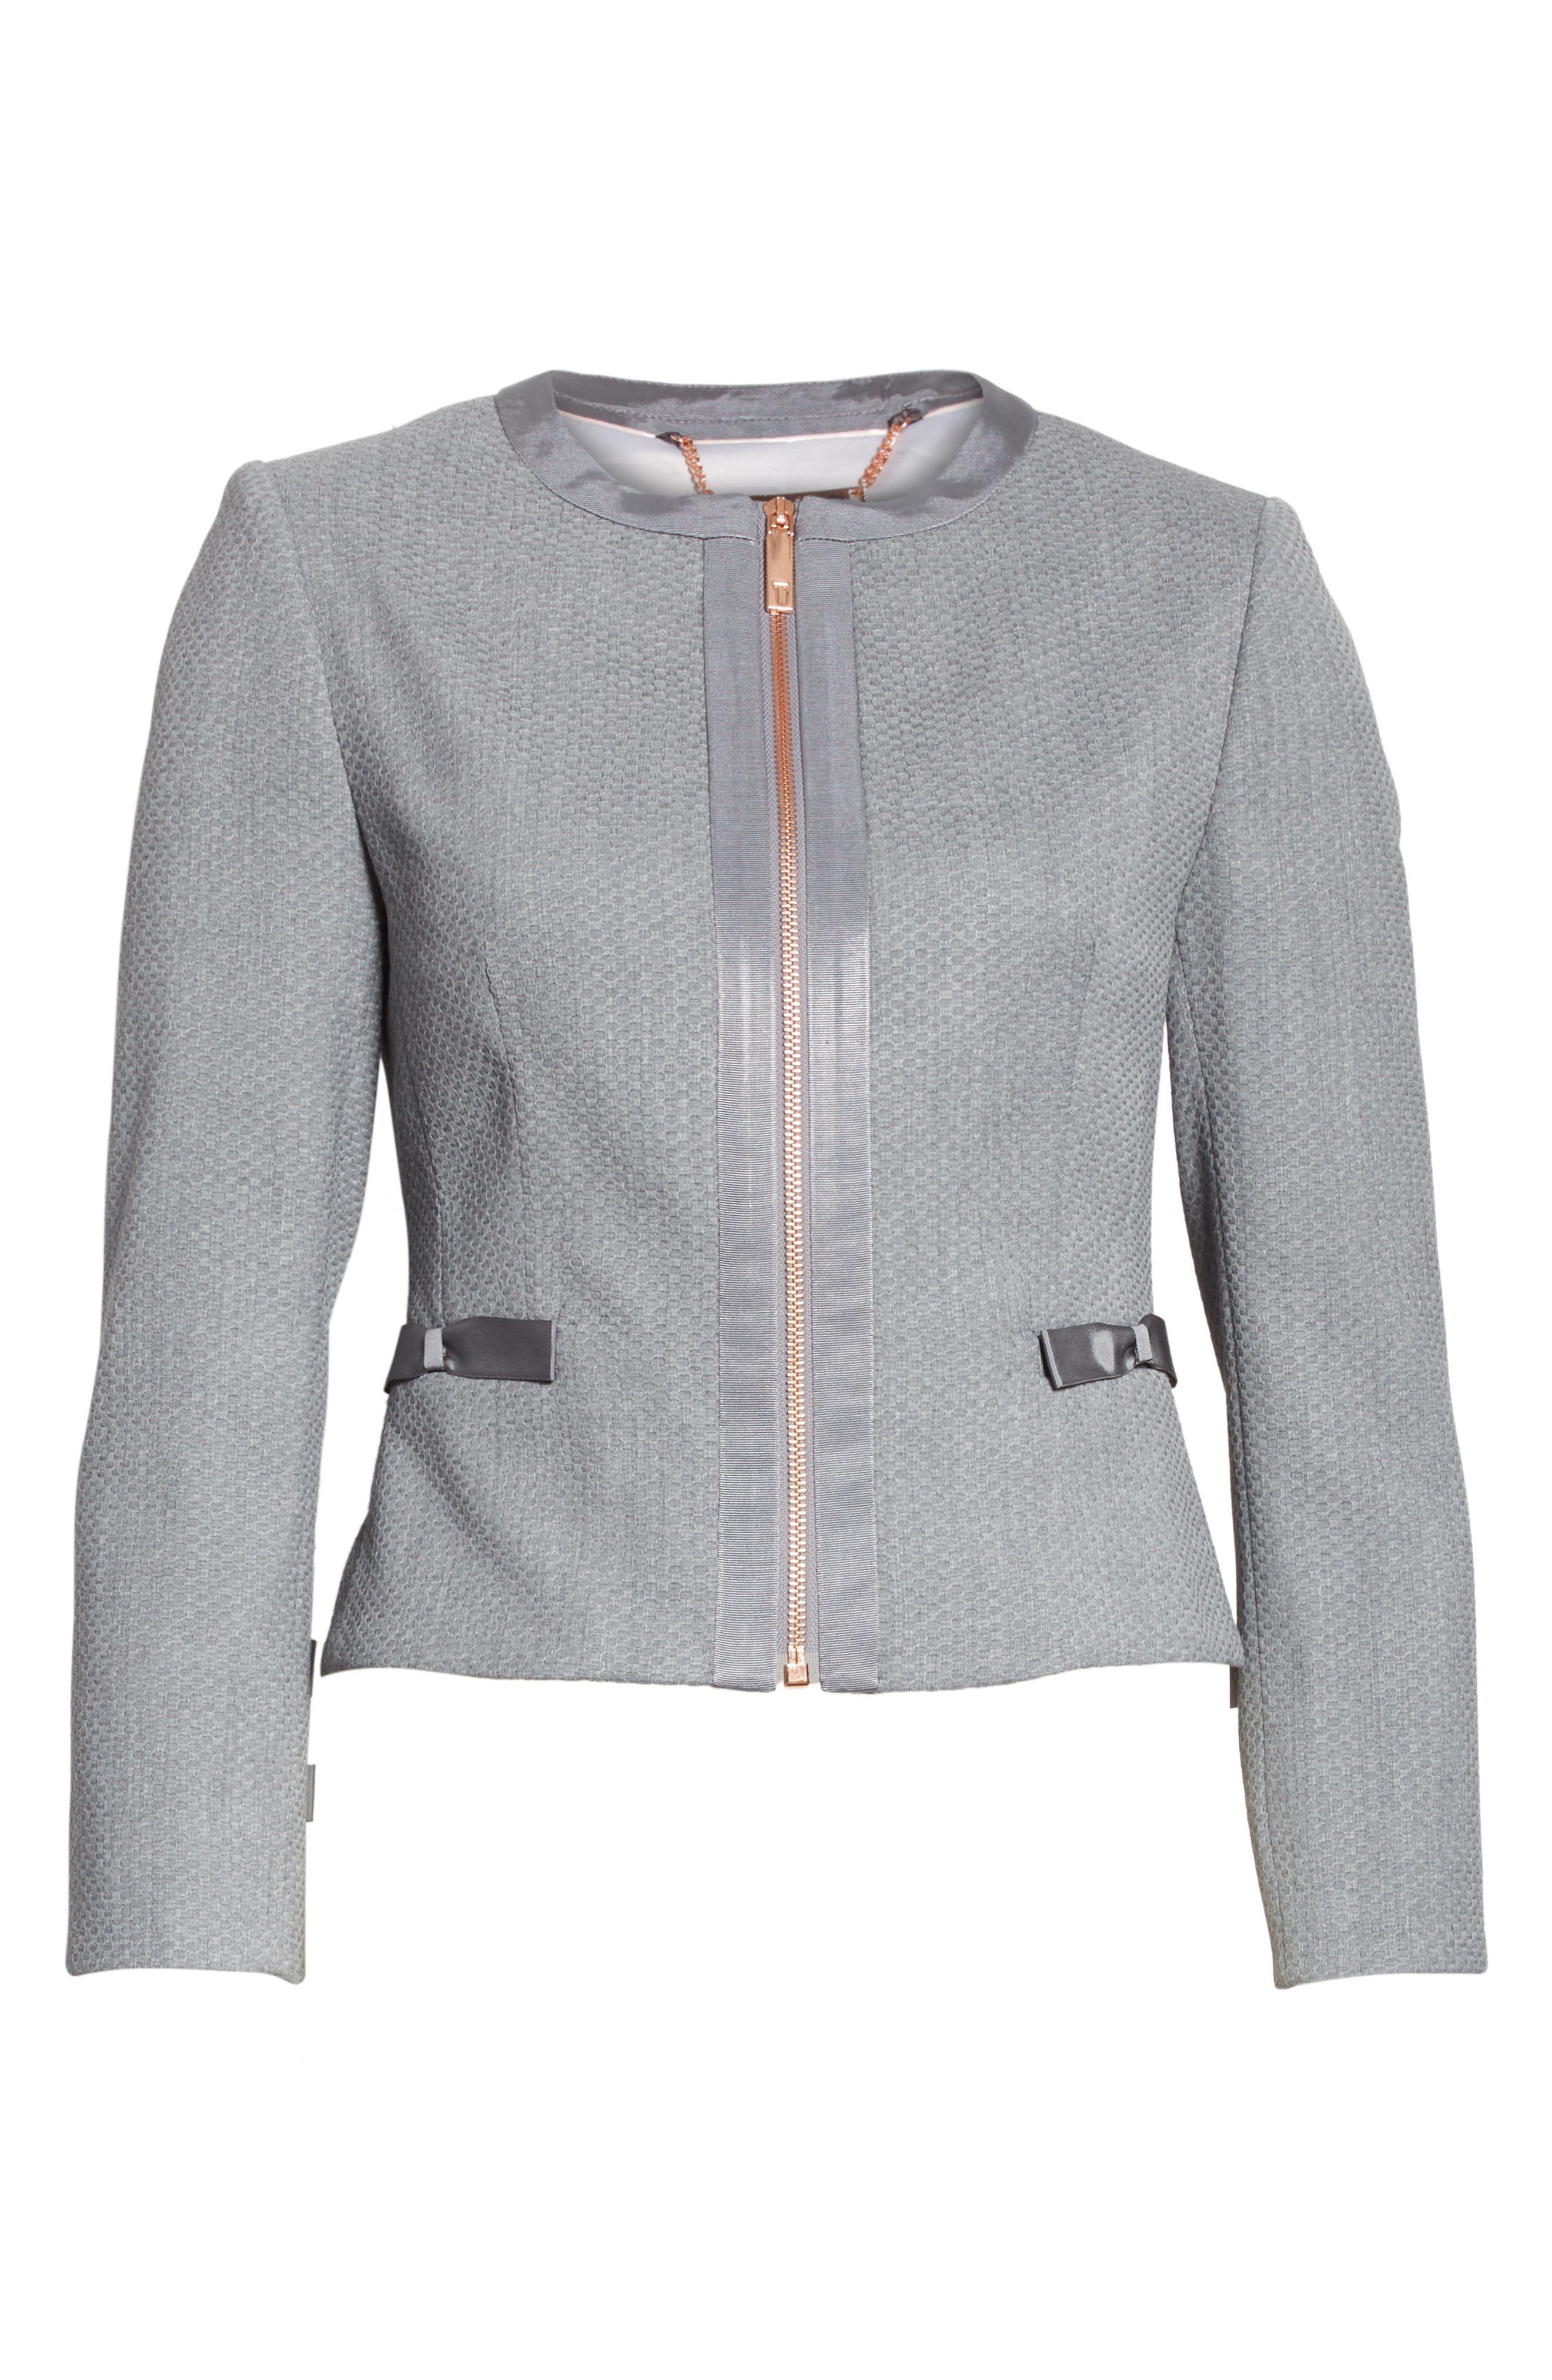 Nadae Bow Detail Crop Jacket,                             Alternate thumbnail 6, color,                             Mid Grey